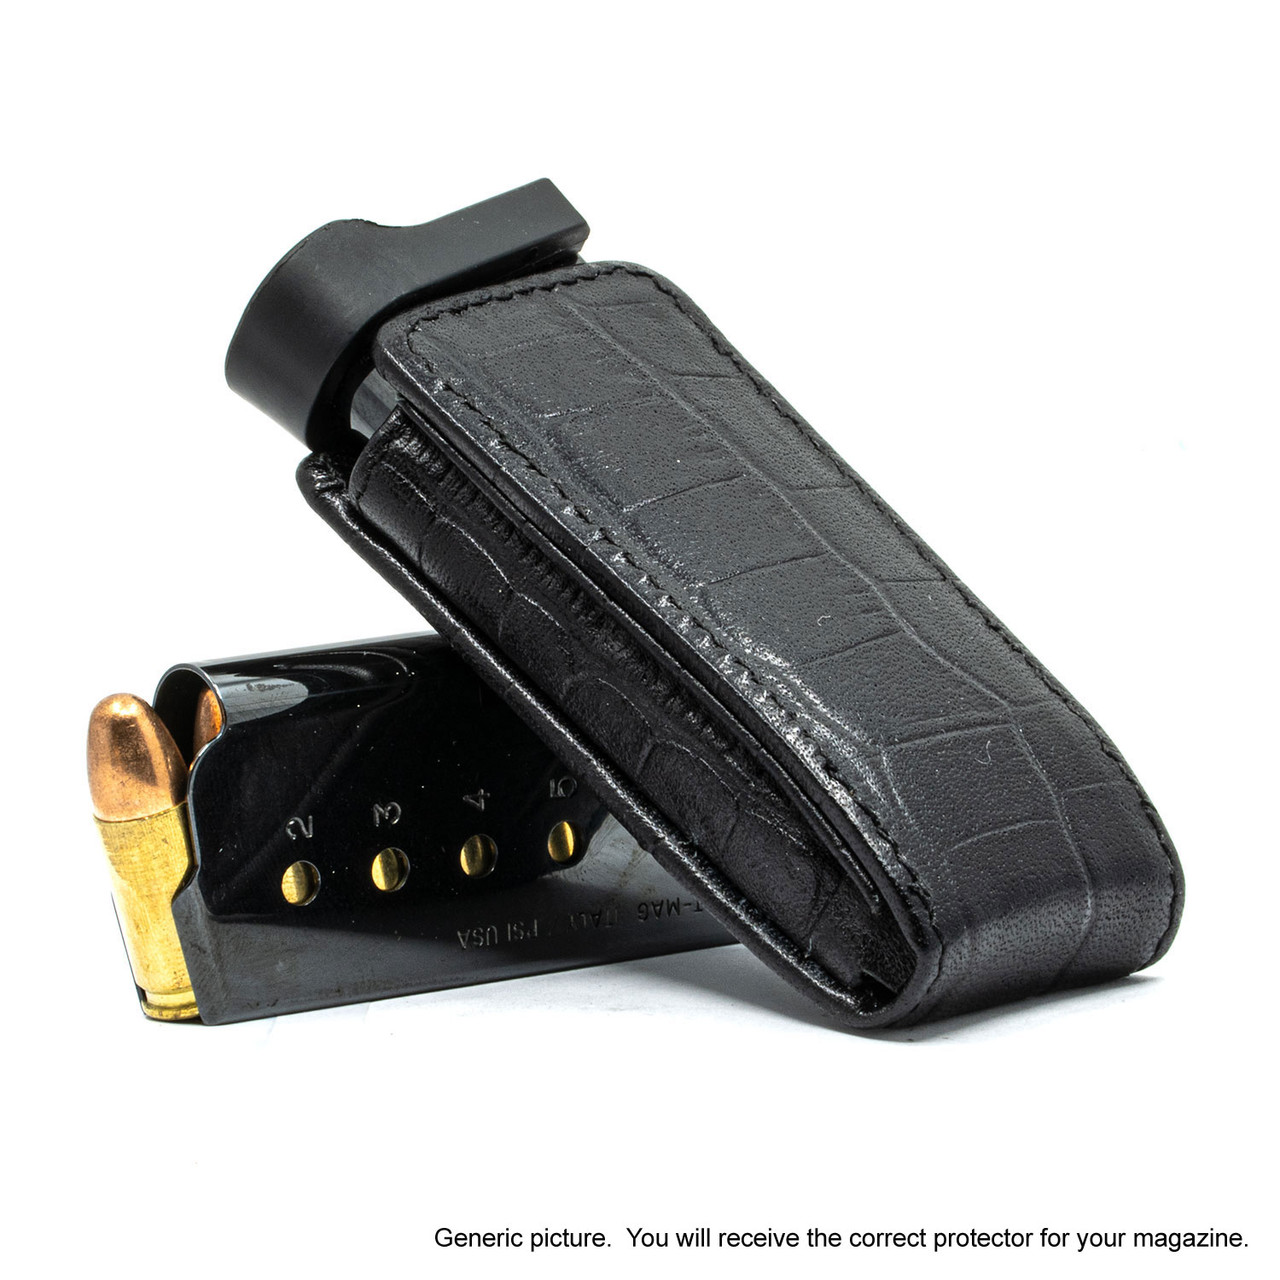 Colt Mark IV Series 80 (.380) Black Alligator Magazine Pocket Protector